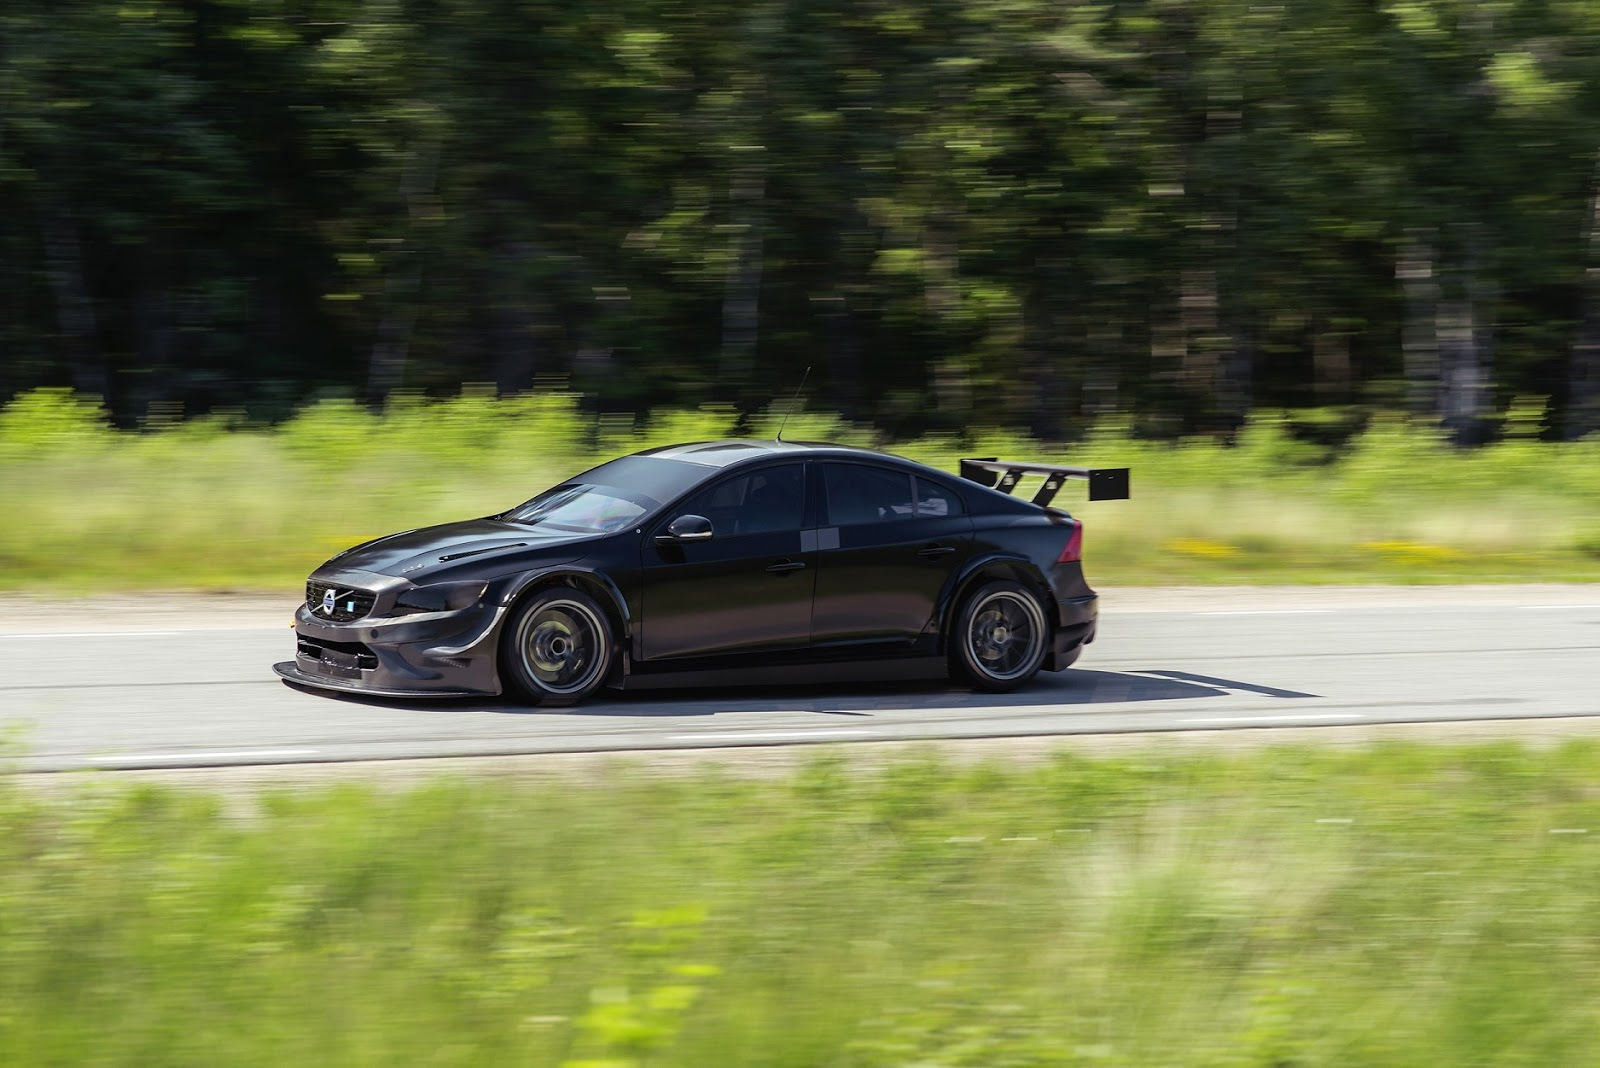 VOLVO POLESTAR%2BCYAN%2BRACING%2BIN%2BWTCC%2BWITH%2BS60%2BPOLESTAR 7 Η Volvo στο WTCC με το S60 Polestar για να γιορτάσει το ένδοξο παρελθόν του Volvo 240 Turbo